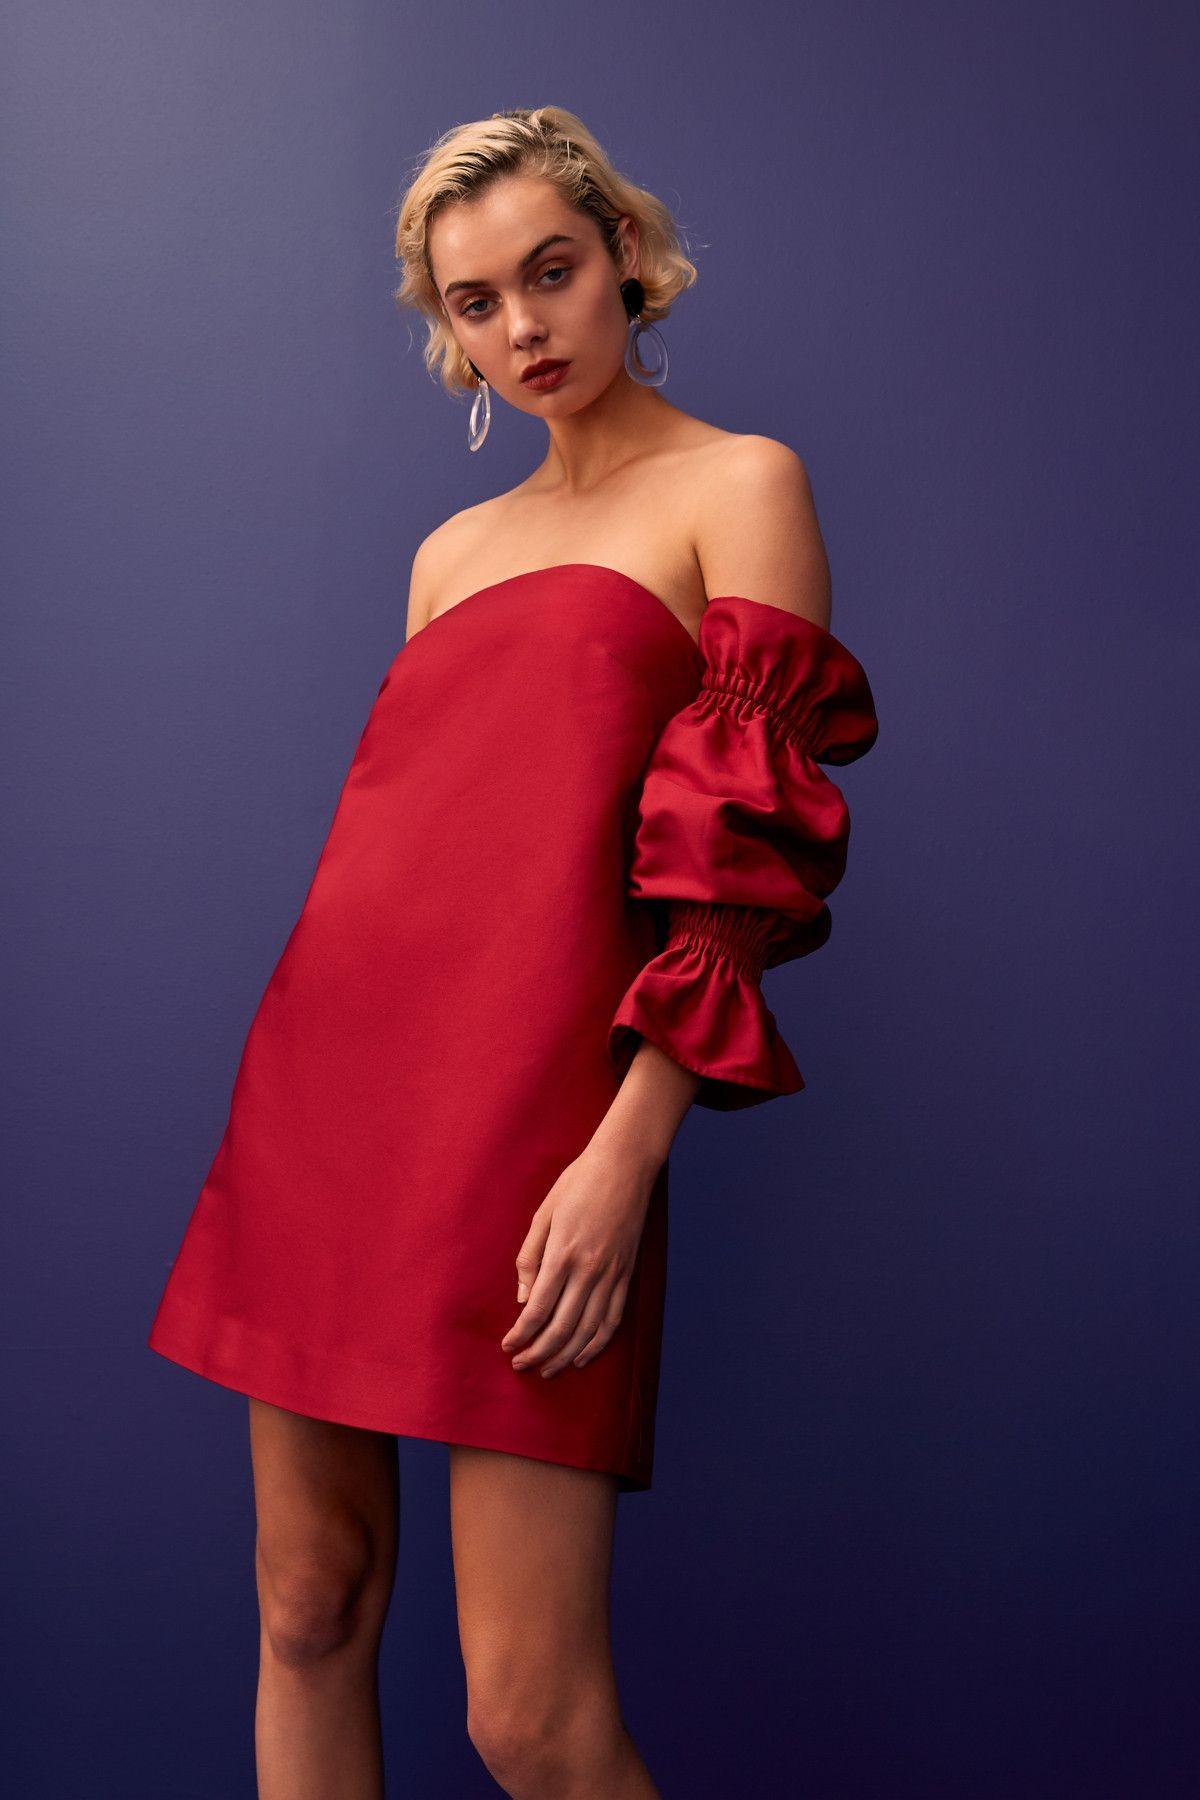 Indulgent Long Sleeve Dress Raspberry C Meo Collective Bnkr Long Sleeve Dress Dresses Dresses With Sleeves [ 1800 x 1200 Pixel ]